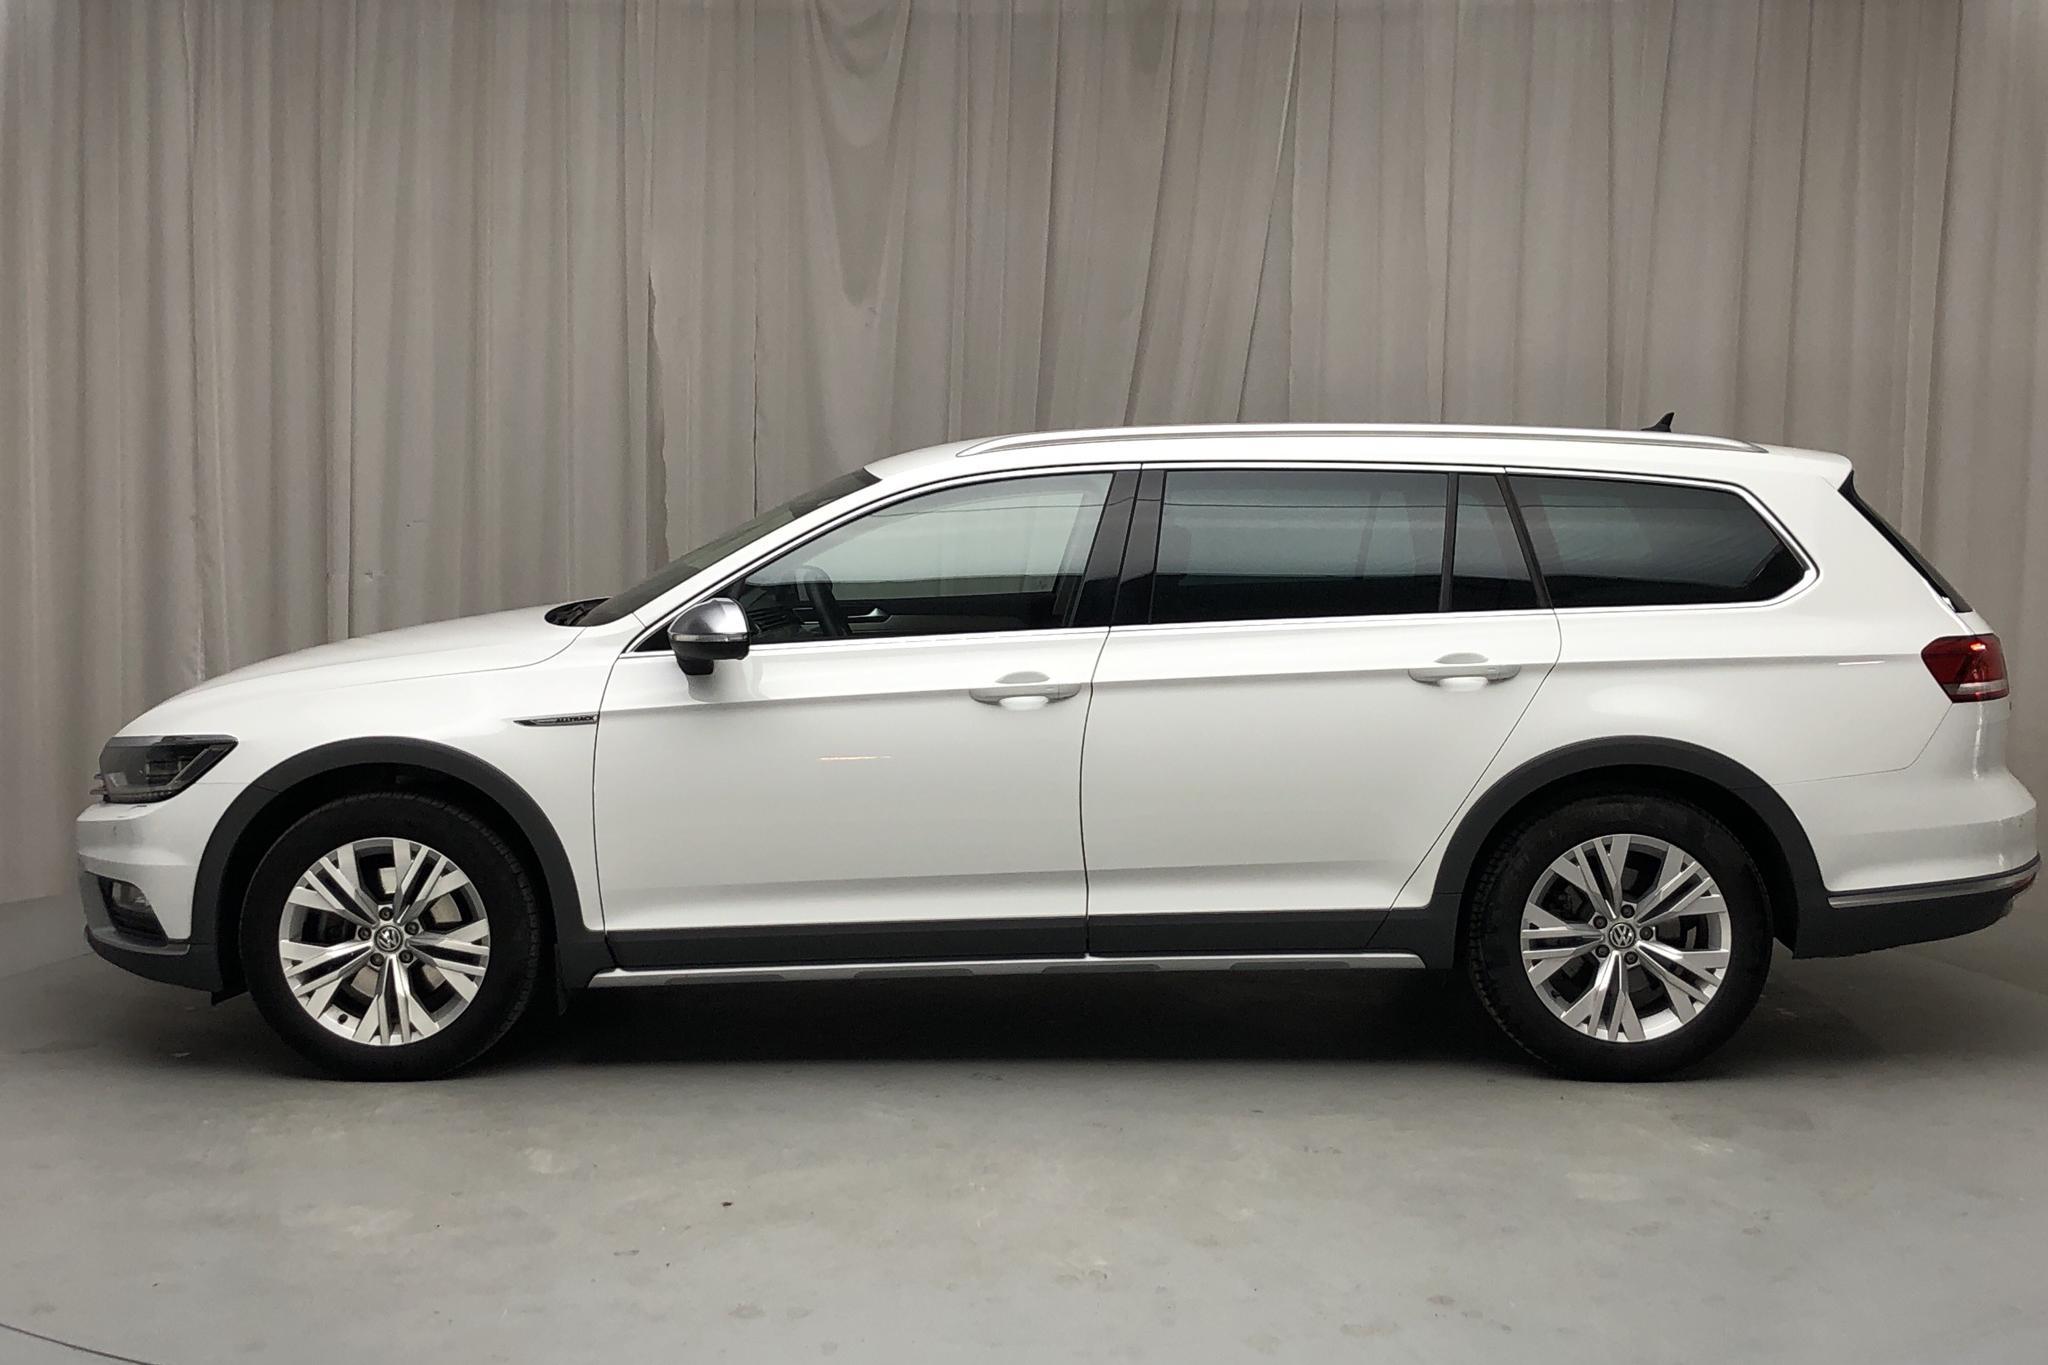 VW Passat Alltrack 2.0 TDI Sportscombi 4MOTION (190hk) - 87 140 km - Automatic - white - 2018